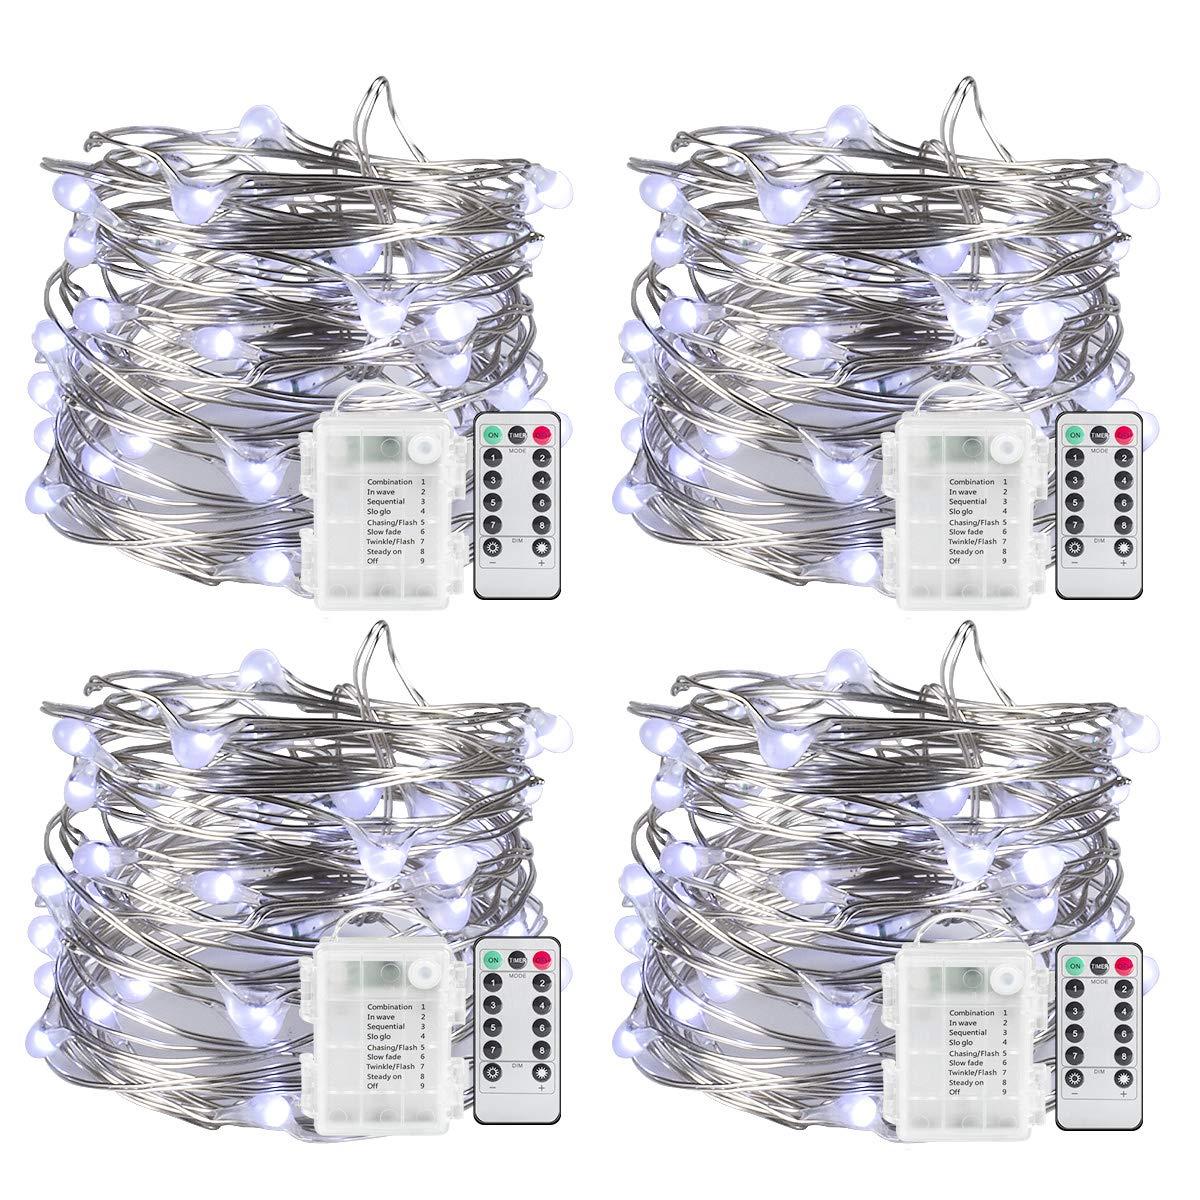 Amazon.com : Sanniu String Lights, 4 Packs Fairy String Lights ...